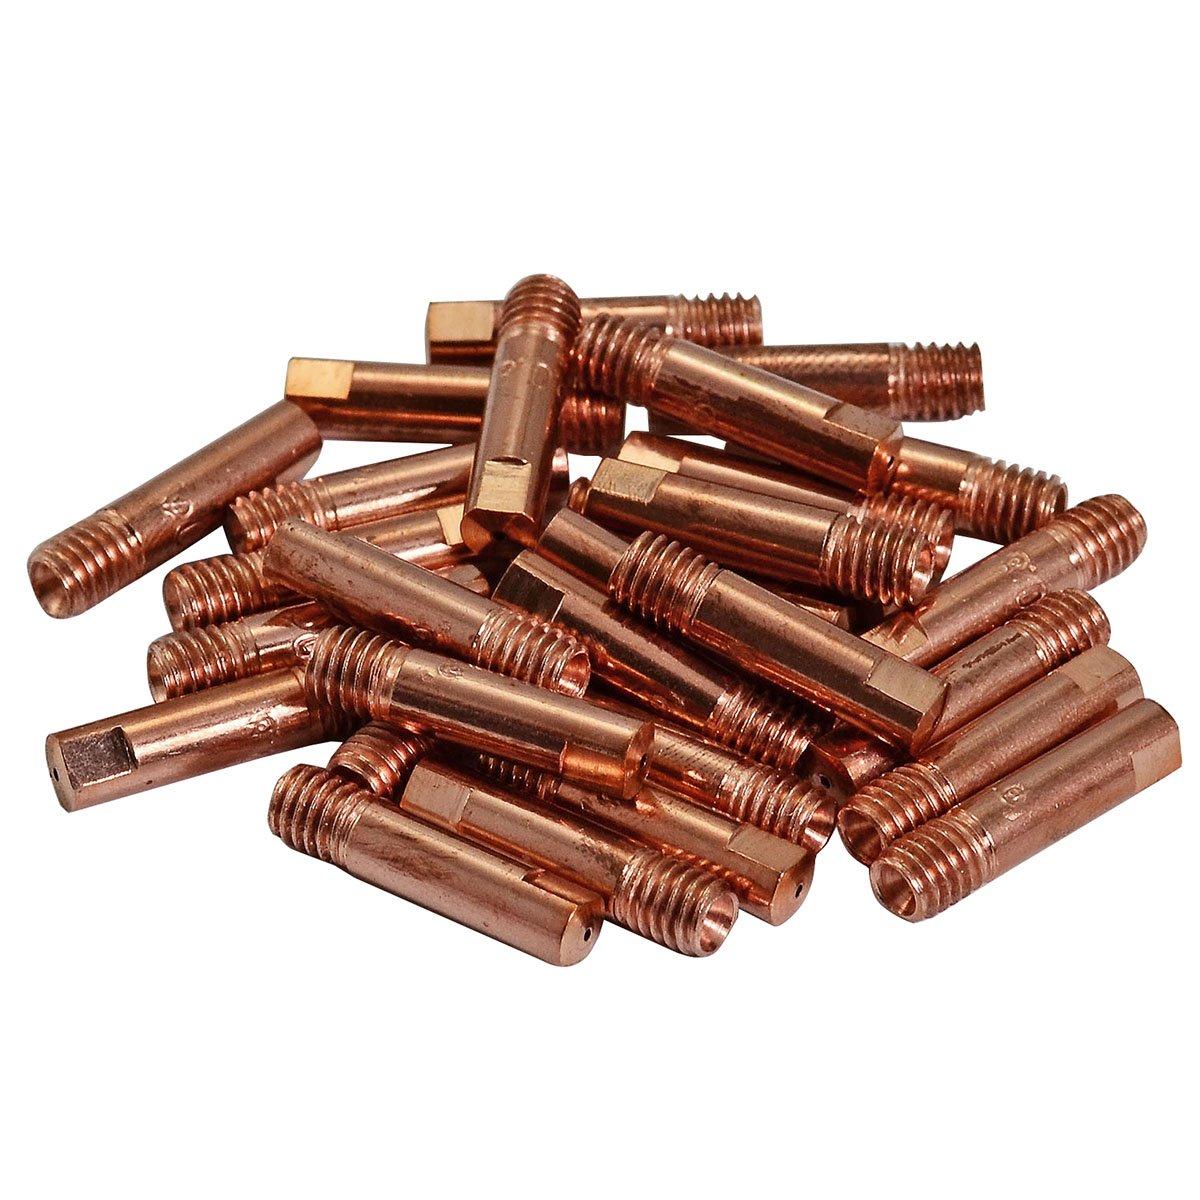 15AK MB15 MAG/MIG Soplete Contacto boquilla Φ 0, 8 M6x25mm 140, 0059 50pk RIVERWELDstore